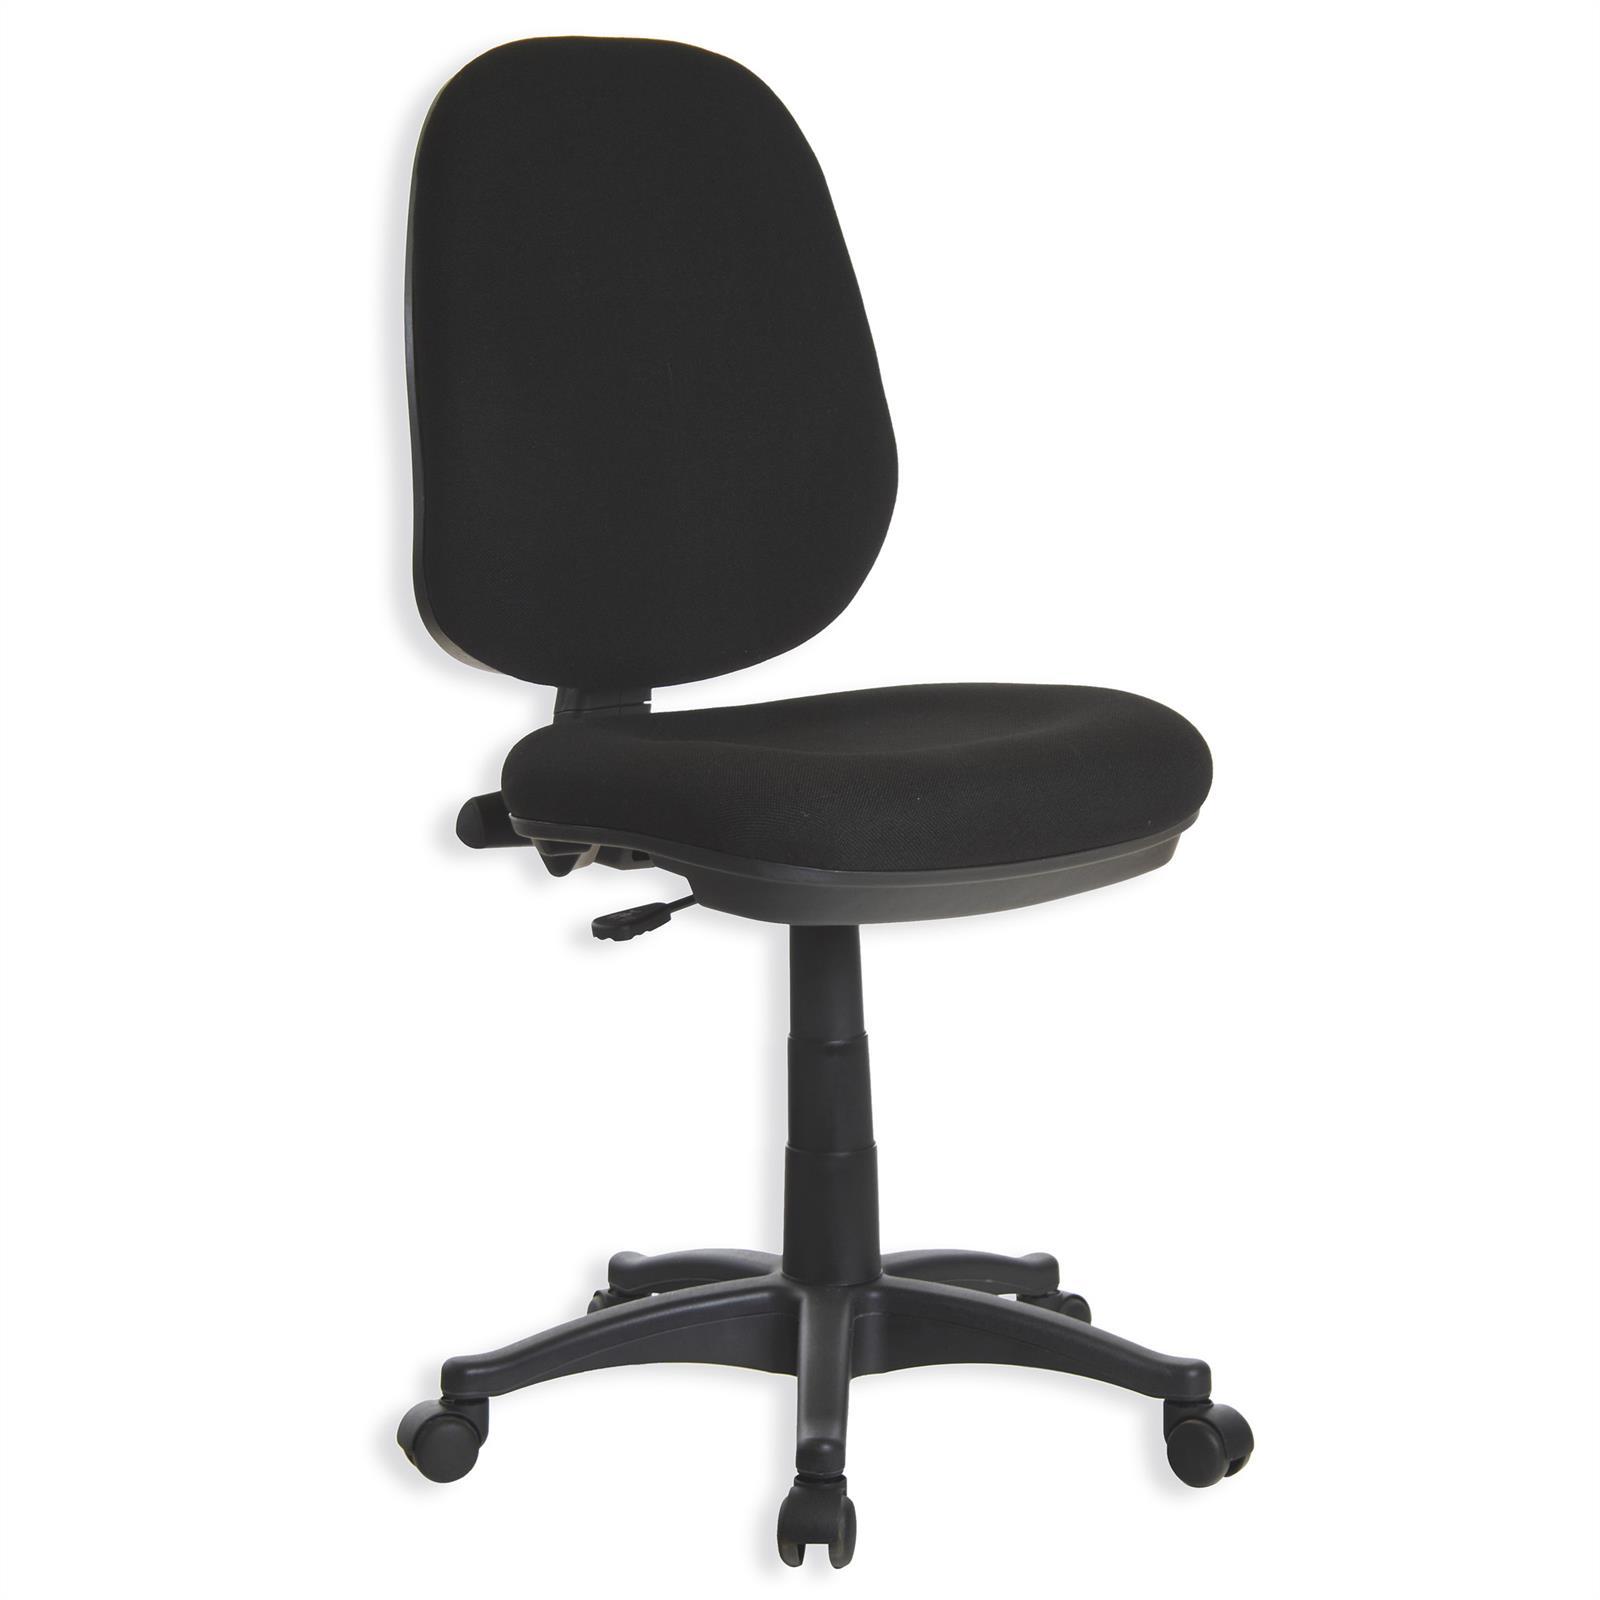 fauteuil de bureau edwin noir mobil meubles. Black Bedroom Furniture Sets. Home Design Ideas